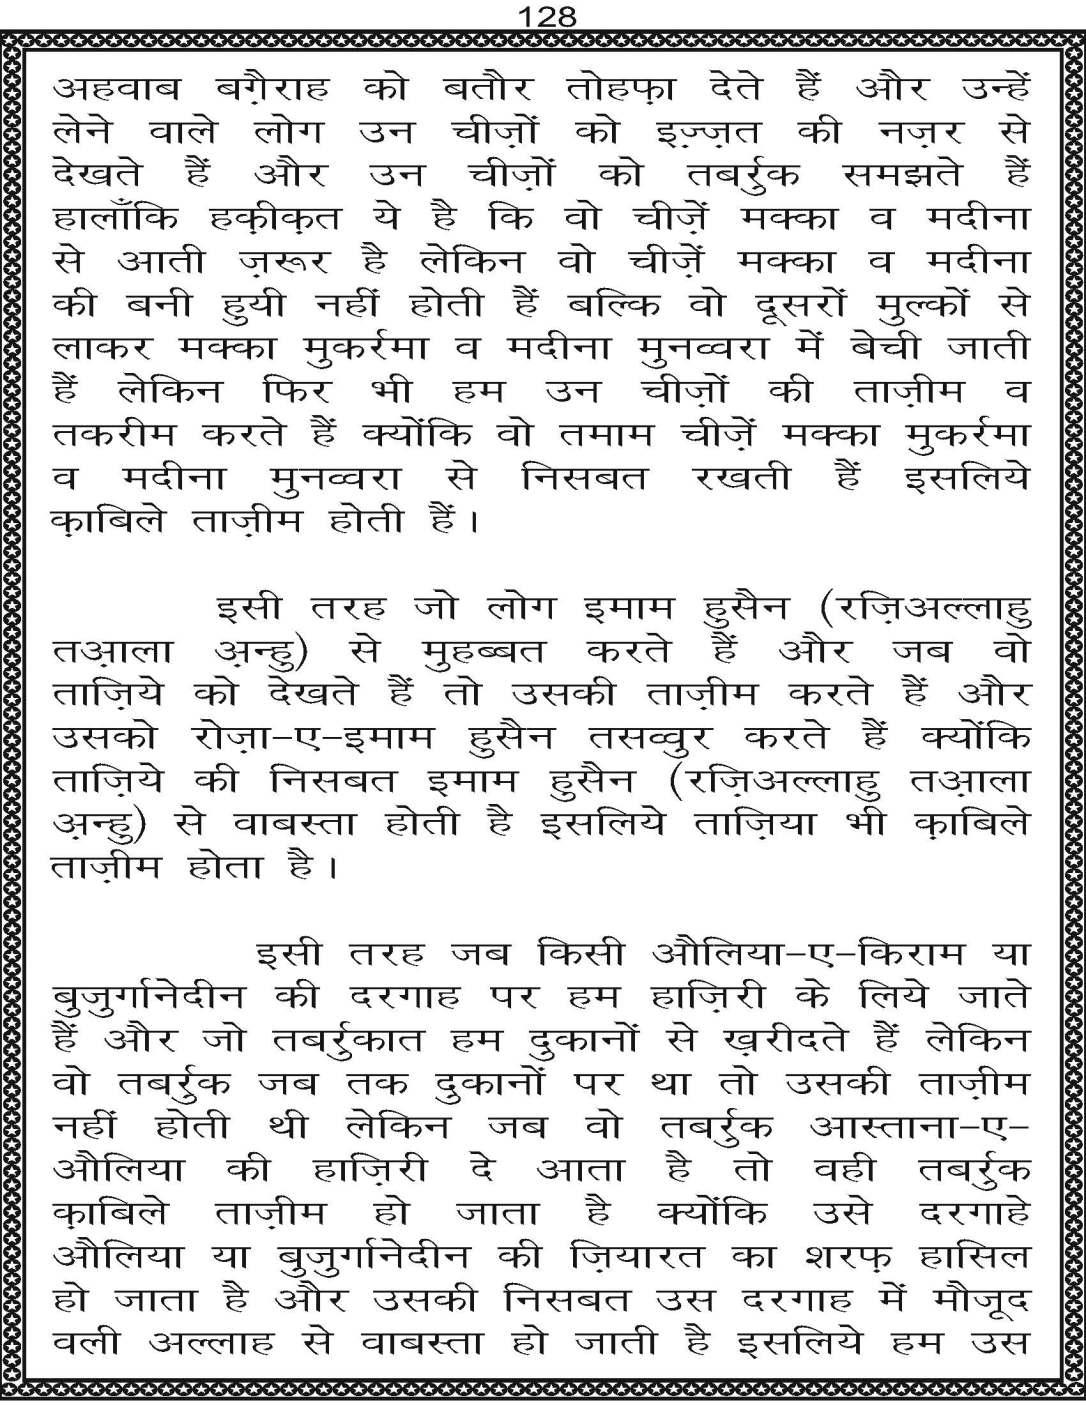 AzmateTaziyadari_Page_128